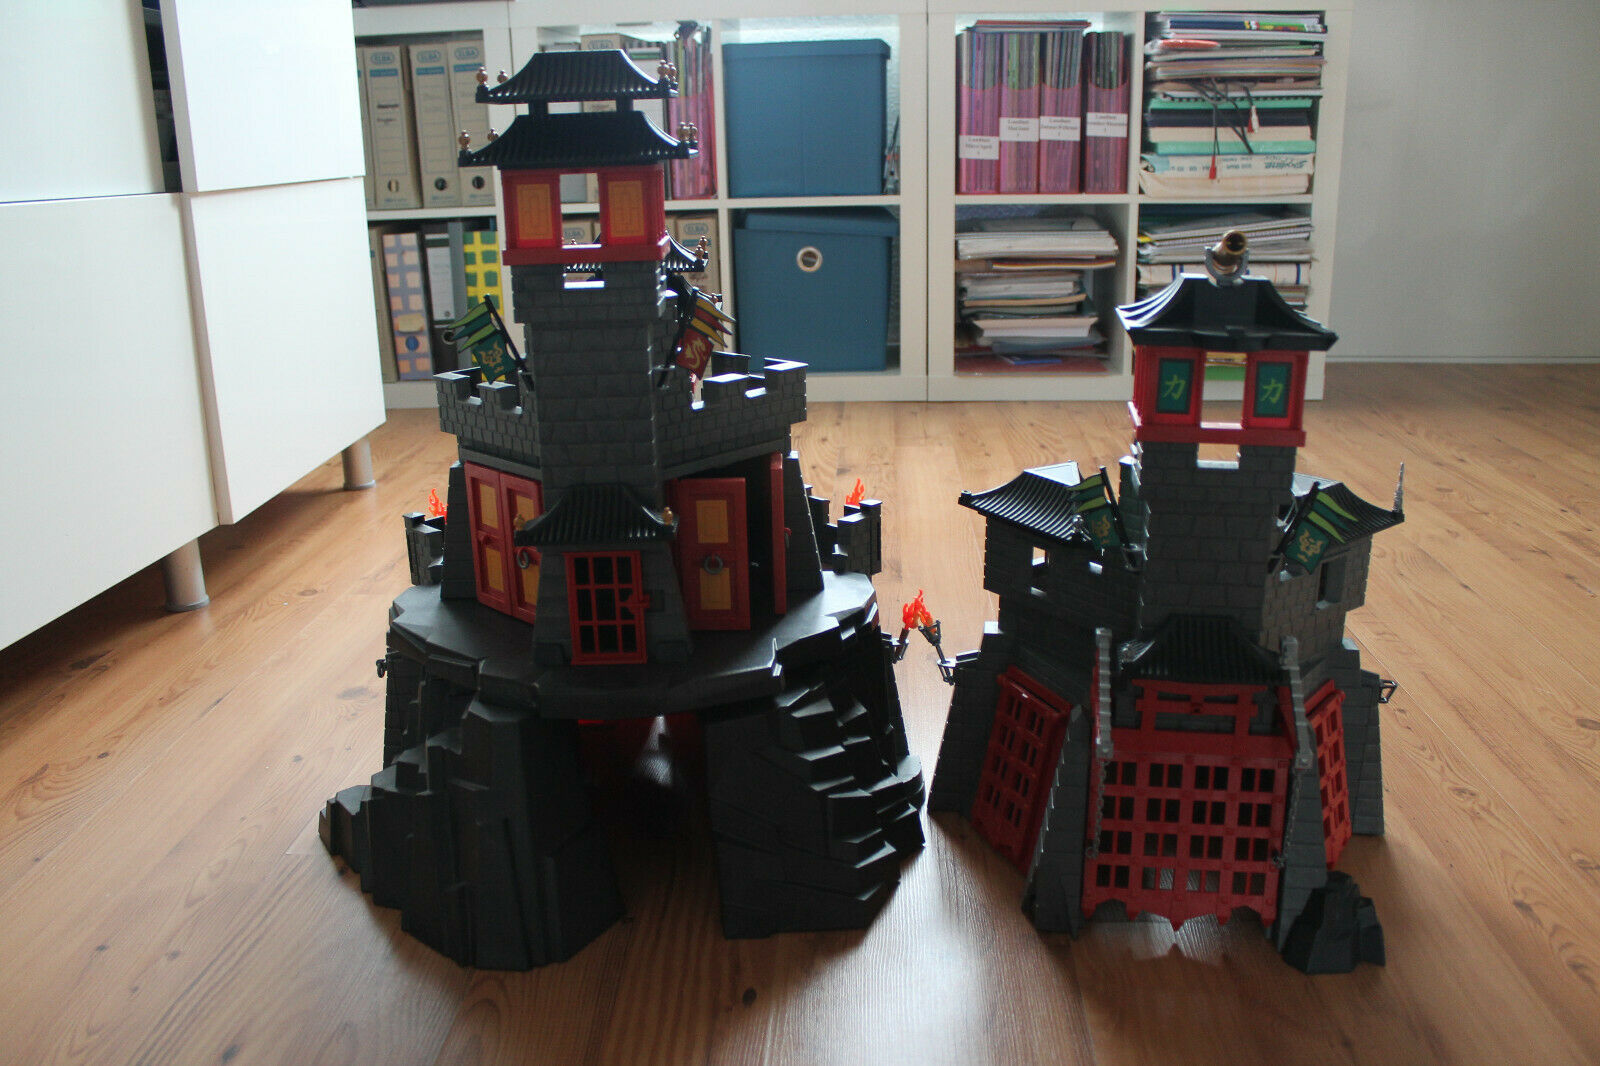 Playmobil 5479 Große Asia-Drachenburg + 5480 Geheime Drachenfestung